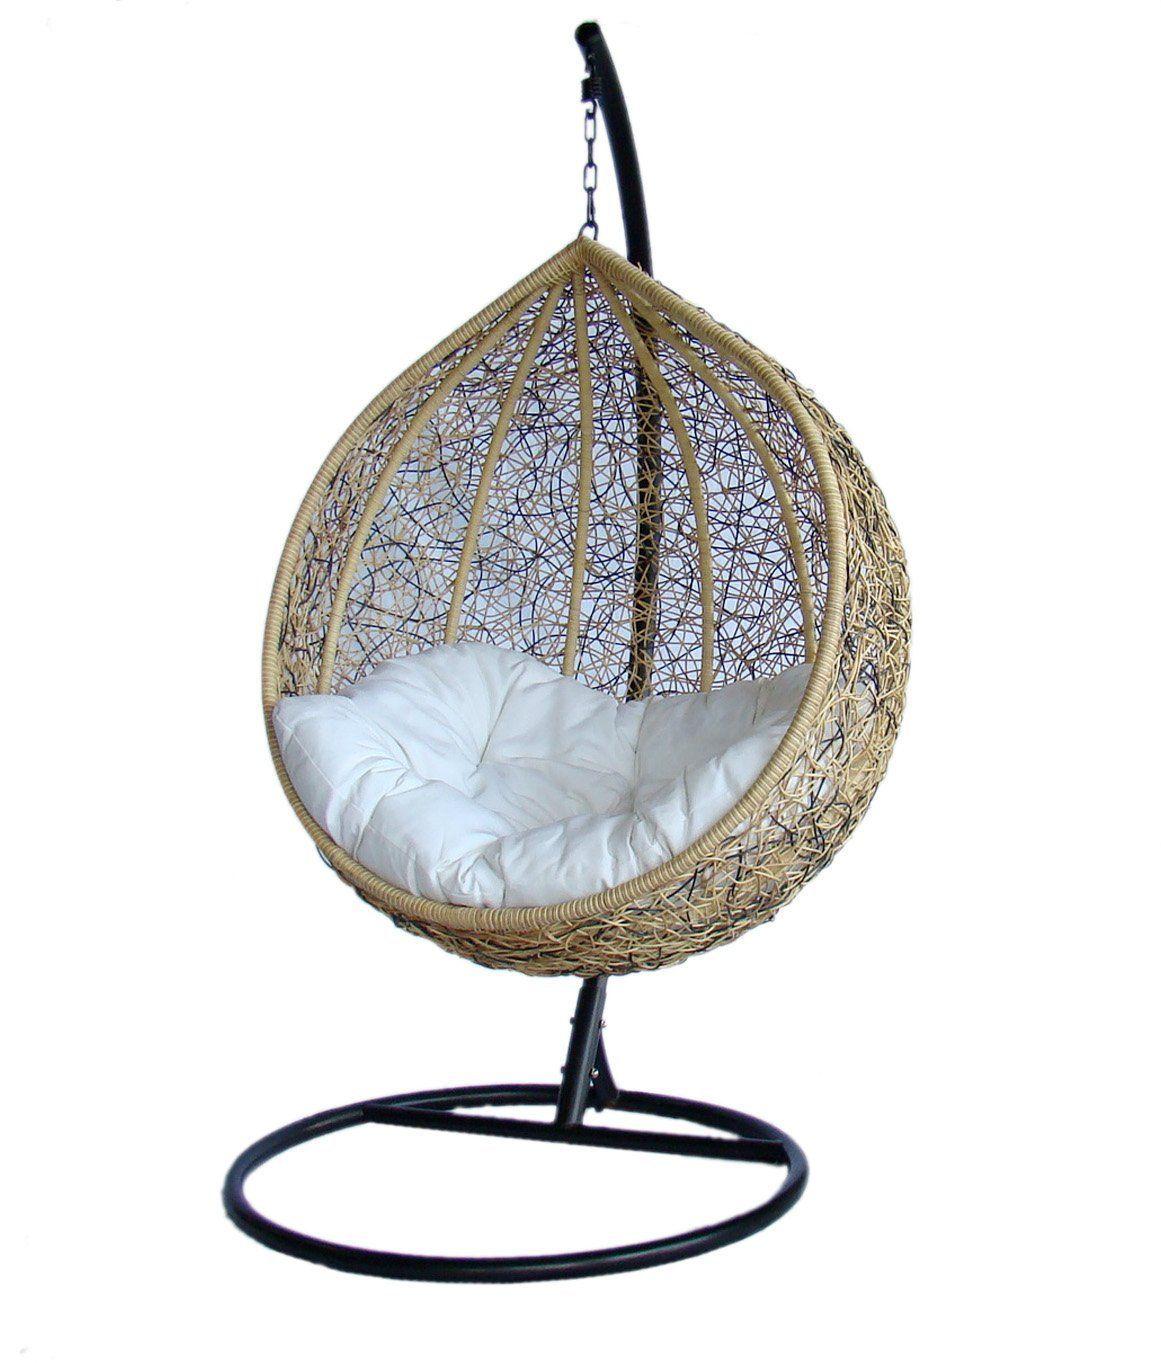 Outdoor Wicker Hammock Chair Rolling Bath Chairs Elderly Amazon Com Trully Swing The Great Hammocks K003ab Patio Lawn Garden